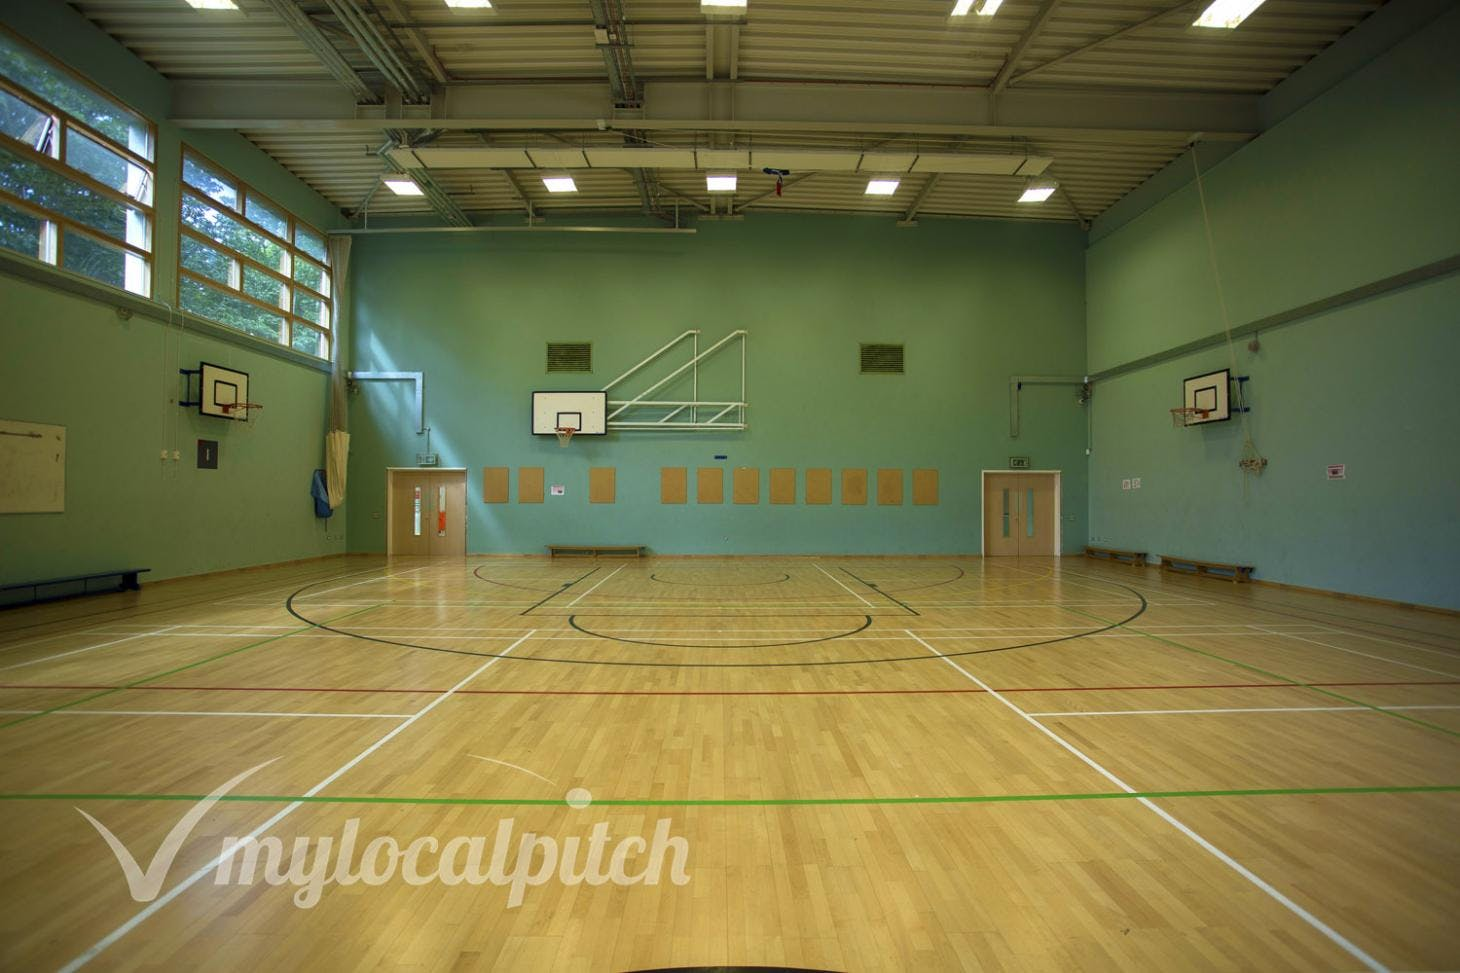 St Augustine's Sports Centre Indoor | Hard badminton court